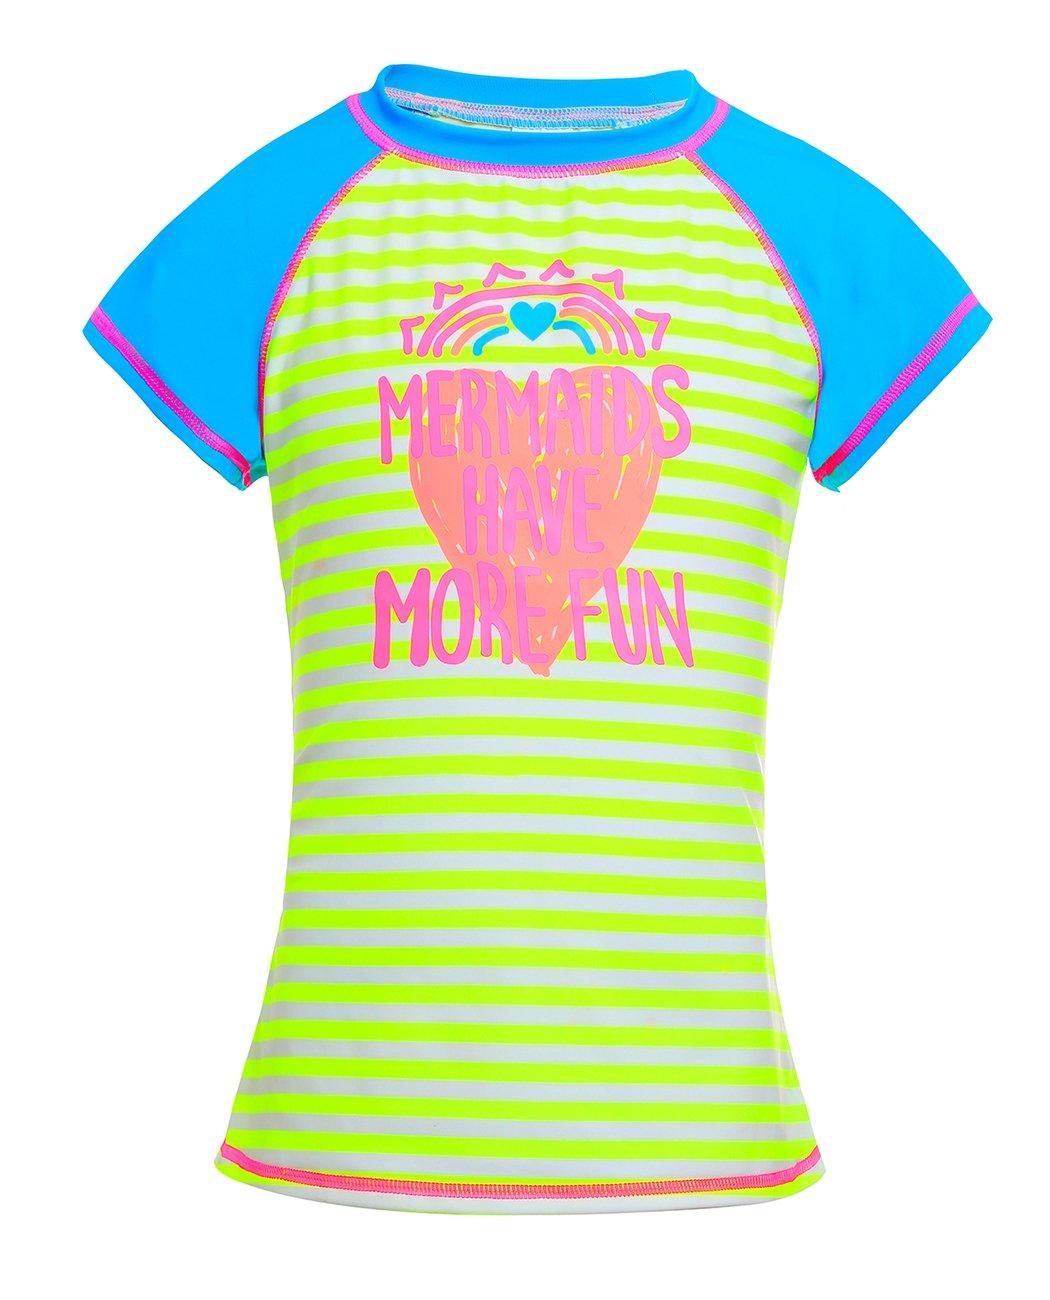 iDrawl Boys Girls Short Sleeve Rash Guards Stripe Printed Swim Tops UPF 50+ for Swimming Surfing